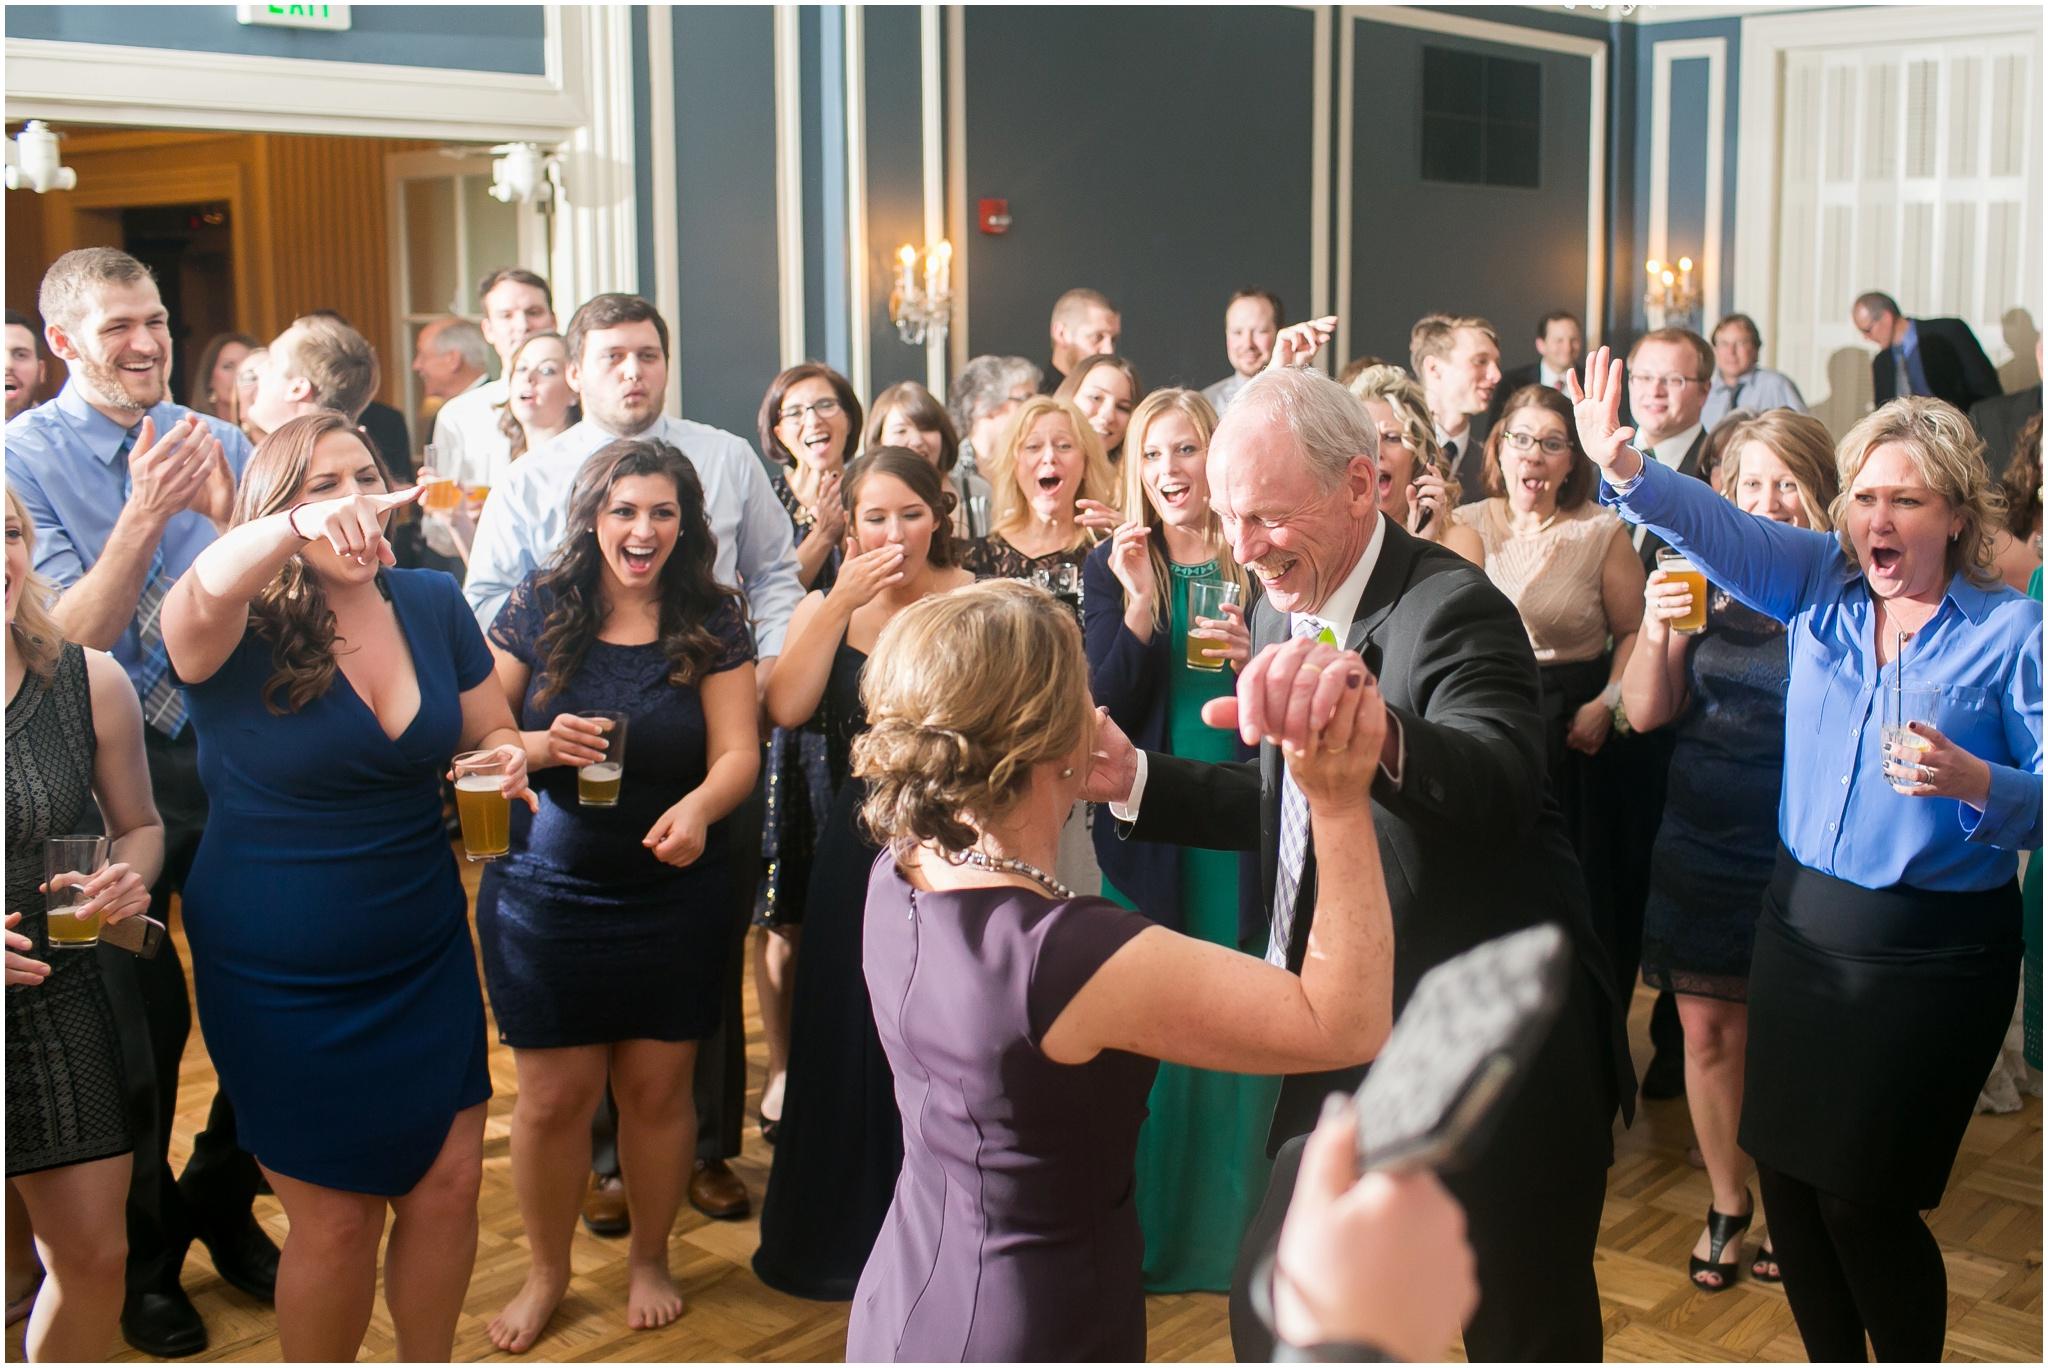 Madison_Club_Madison_Wisconsin_Wedding_Photographer_Spring_Rainy_Wedding_2680.jpg